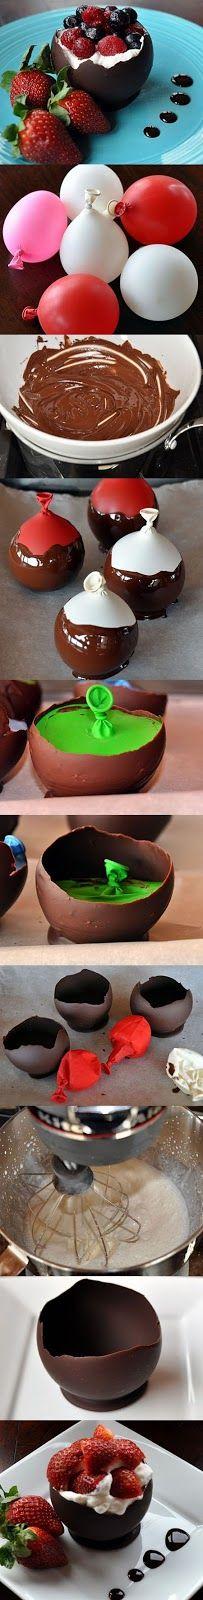 Chocolate edible bowls for ice cream, yogurt, or fruit!